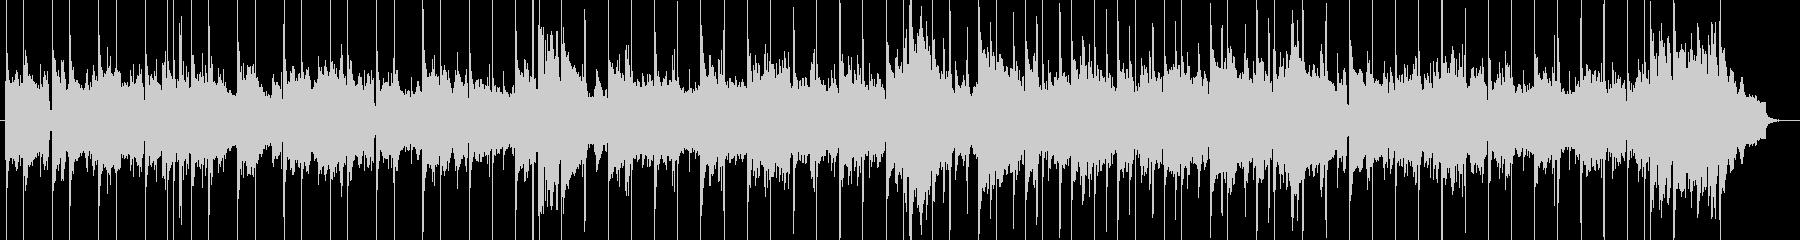 R&BスローバラードBGMの未再生の波形